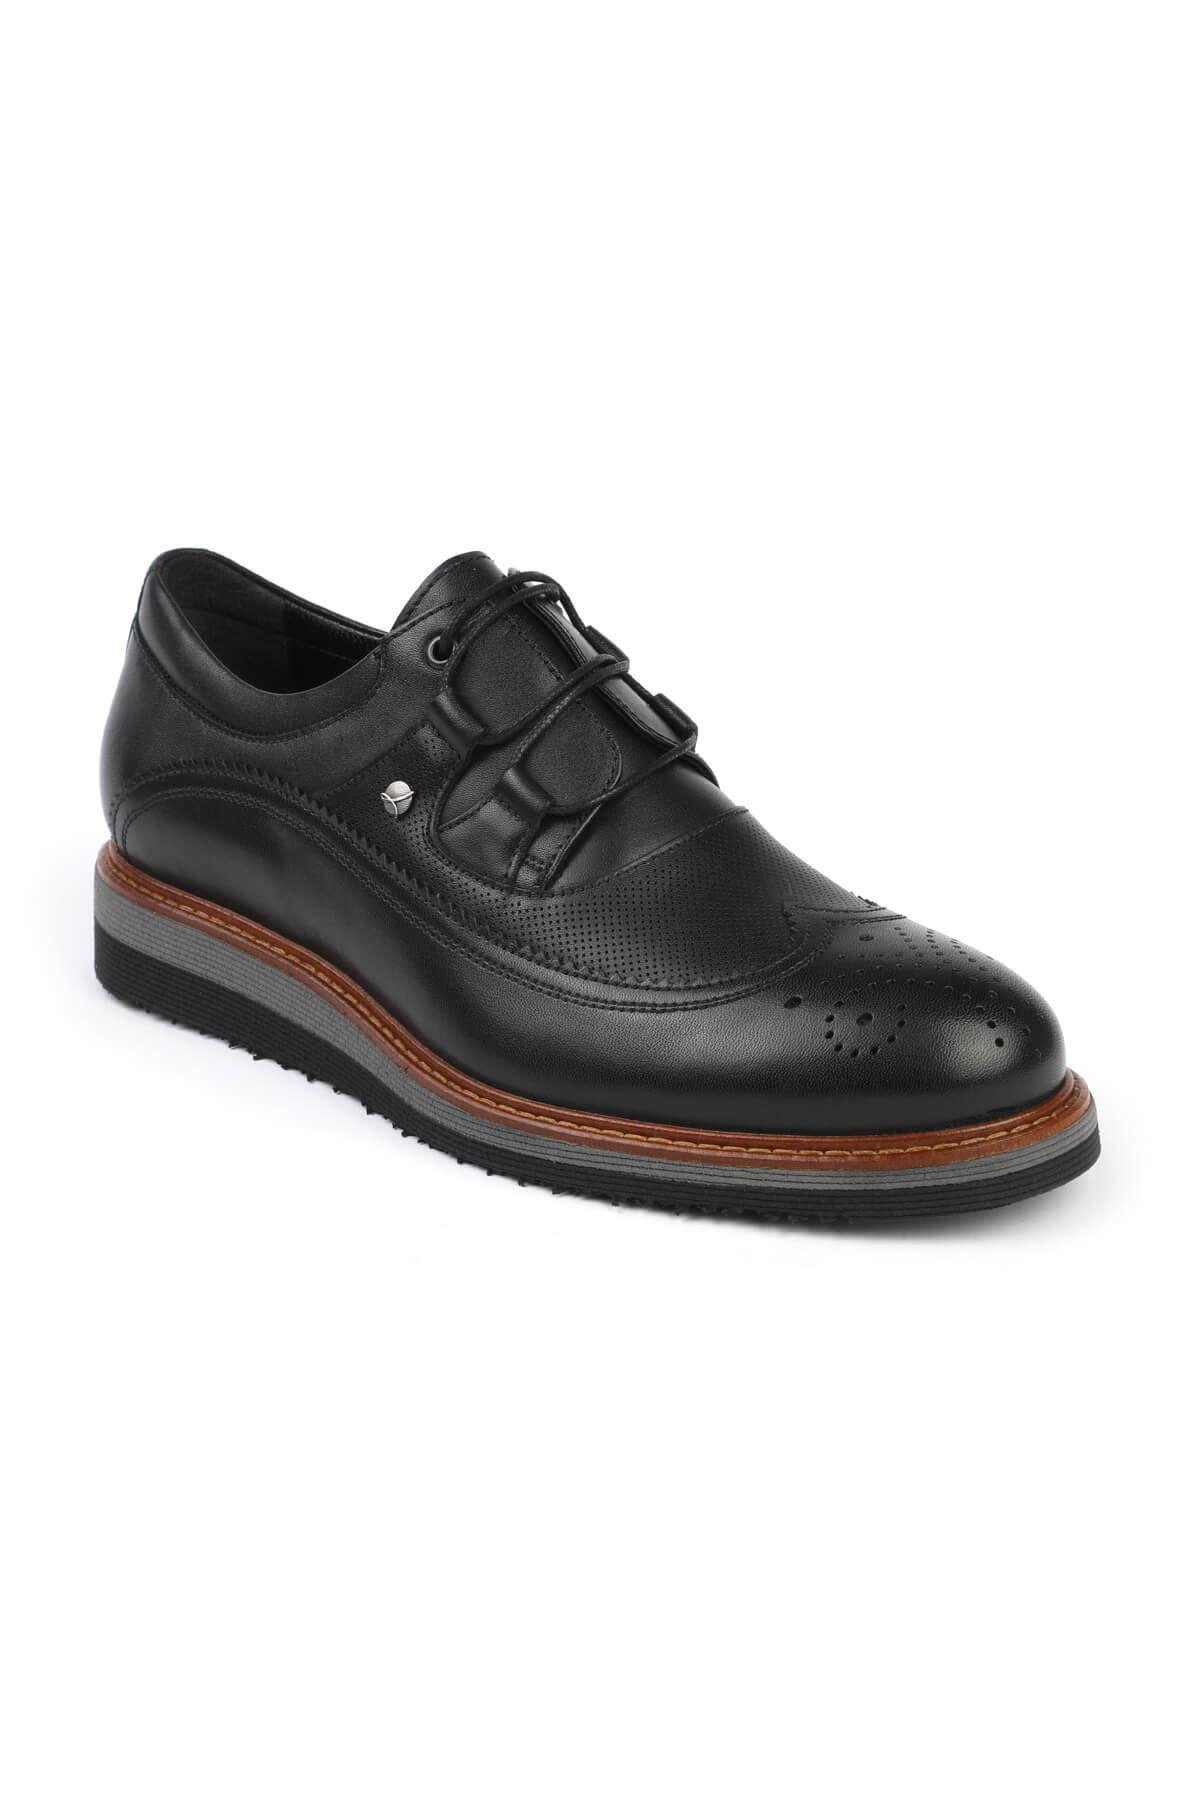 Libero 2902 Black Oxford Shoes